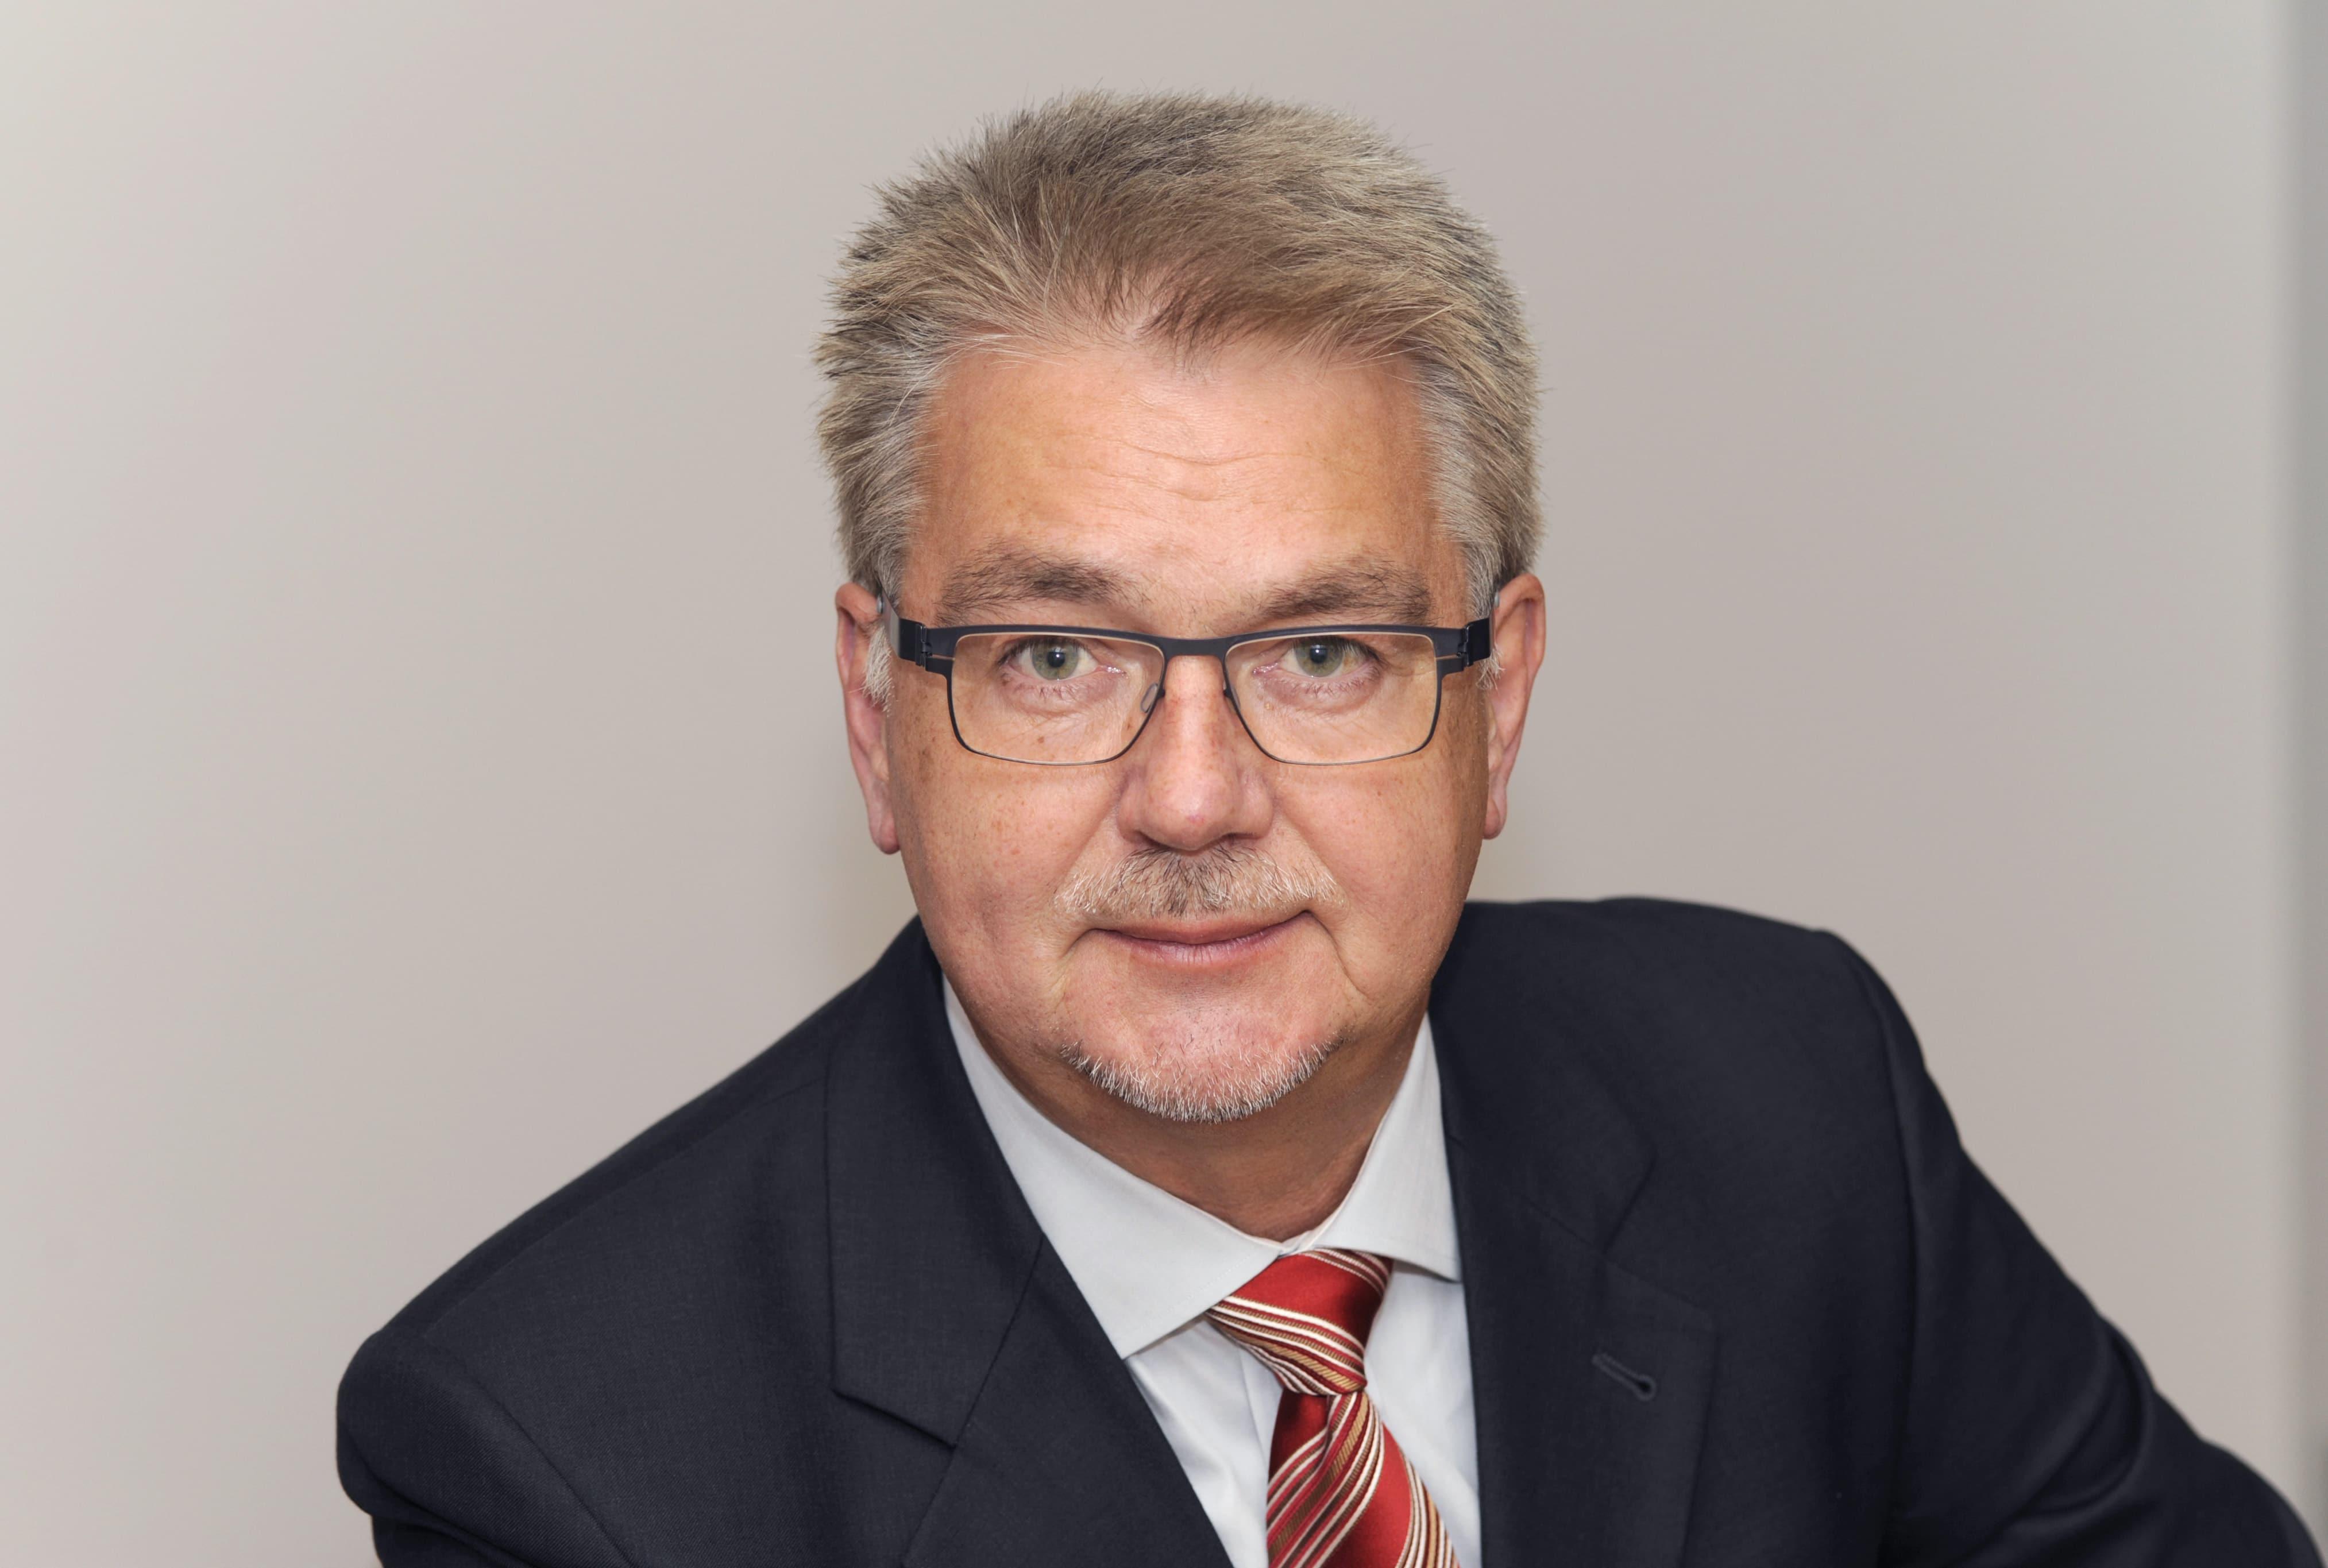 Lothar Rolke (c) Norbert Neetz